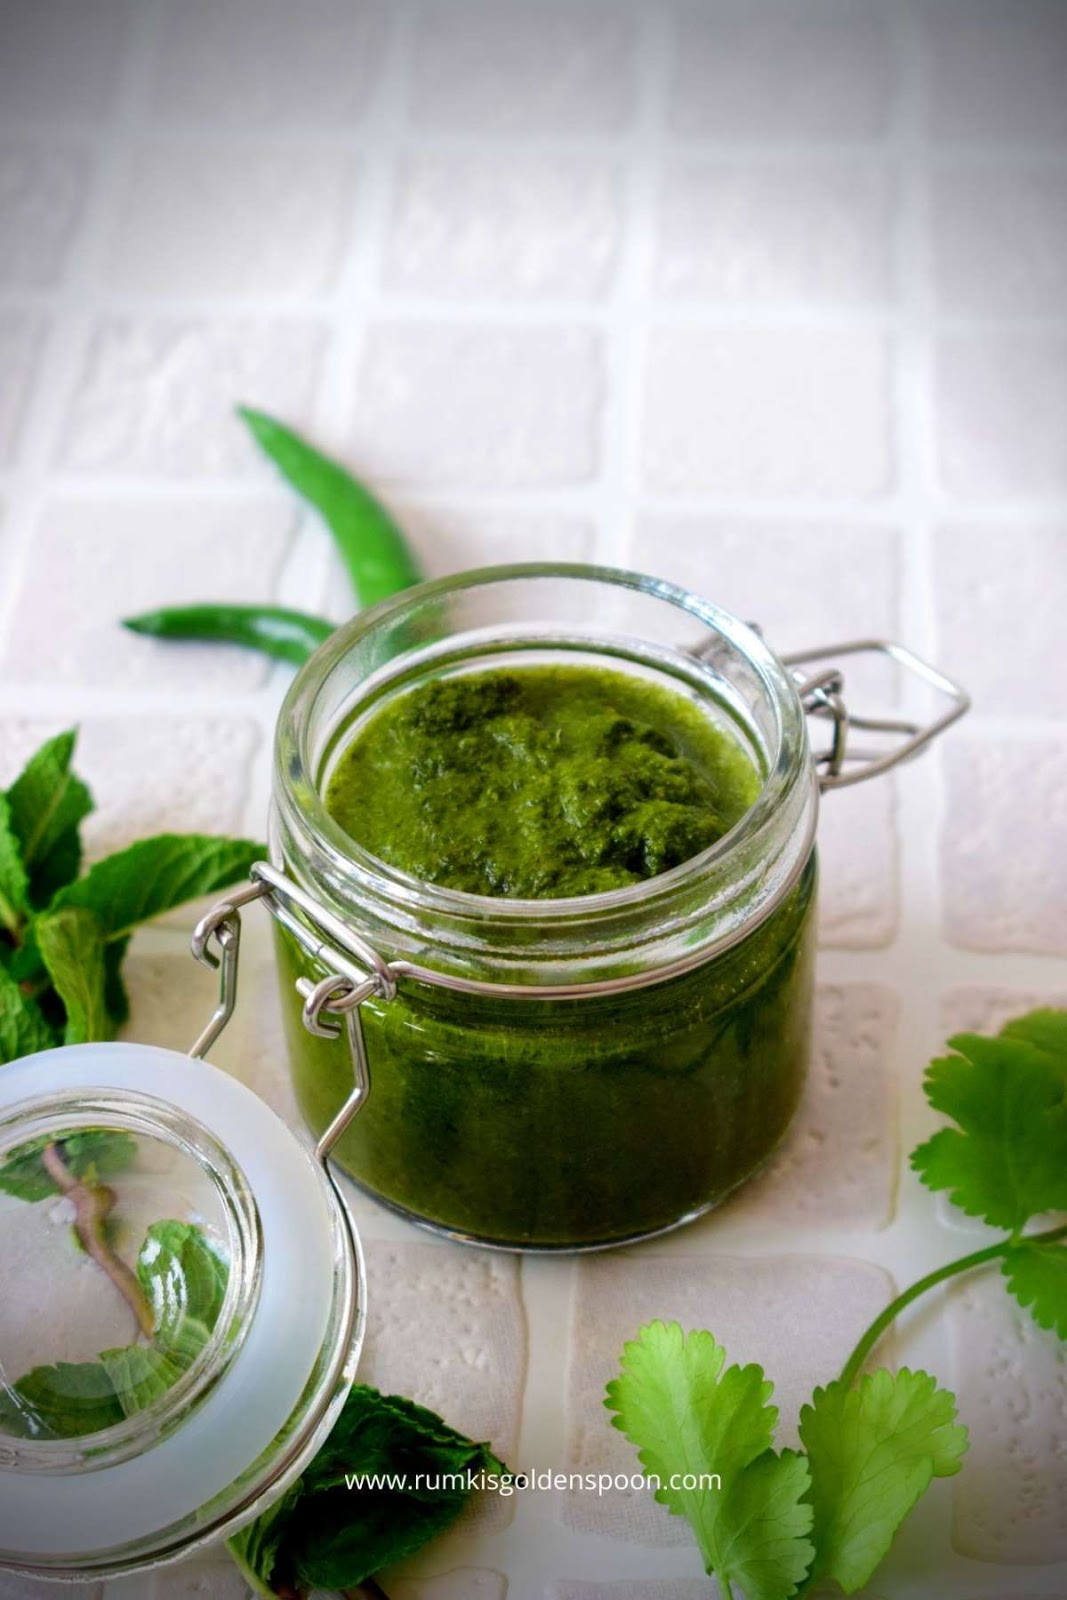 chutney recipe, green chutney, hari chutney, hari chutney recipe, recipe for green chutney, green chutney recipe, green chutney for chaat, green chutney recipe, green chutney recipe for chaat, green chutney sandwich, how to make green chutney, green chutney for bhel, coriander mint cutney, dhaniya pudina ki chutney, chutney for chaat, Indian chutney recipe, chaat recipes, recipes for chaat, recipes of chaat, Rumki's Golden Spoon